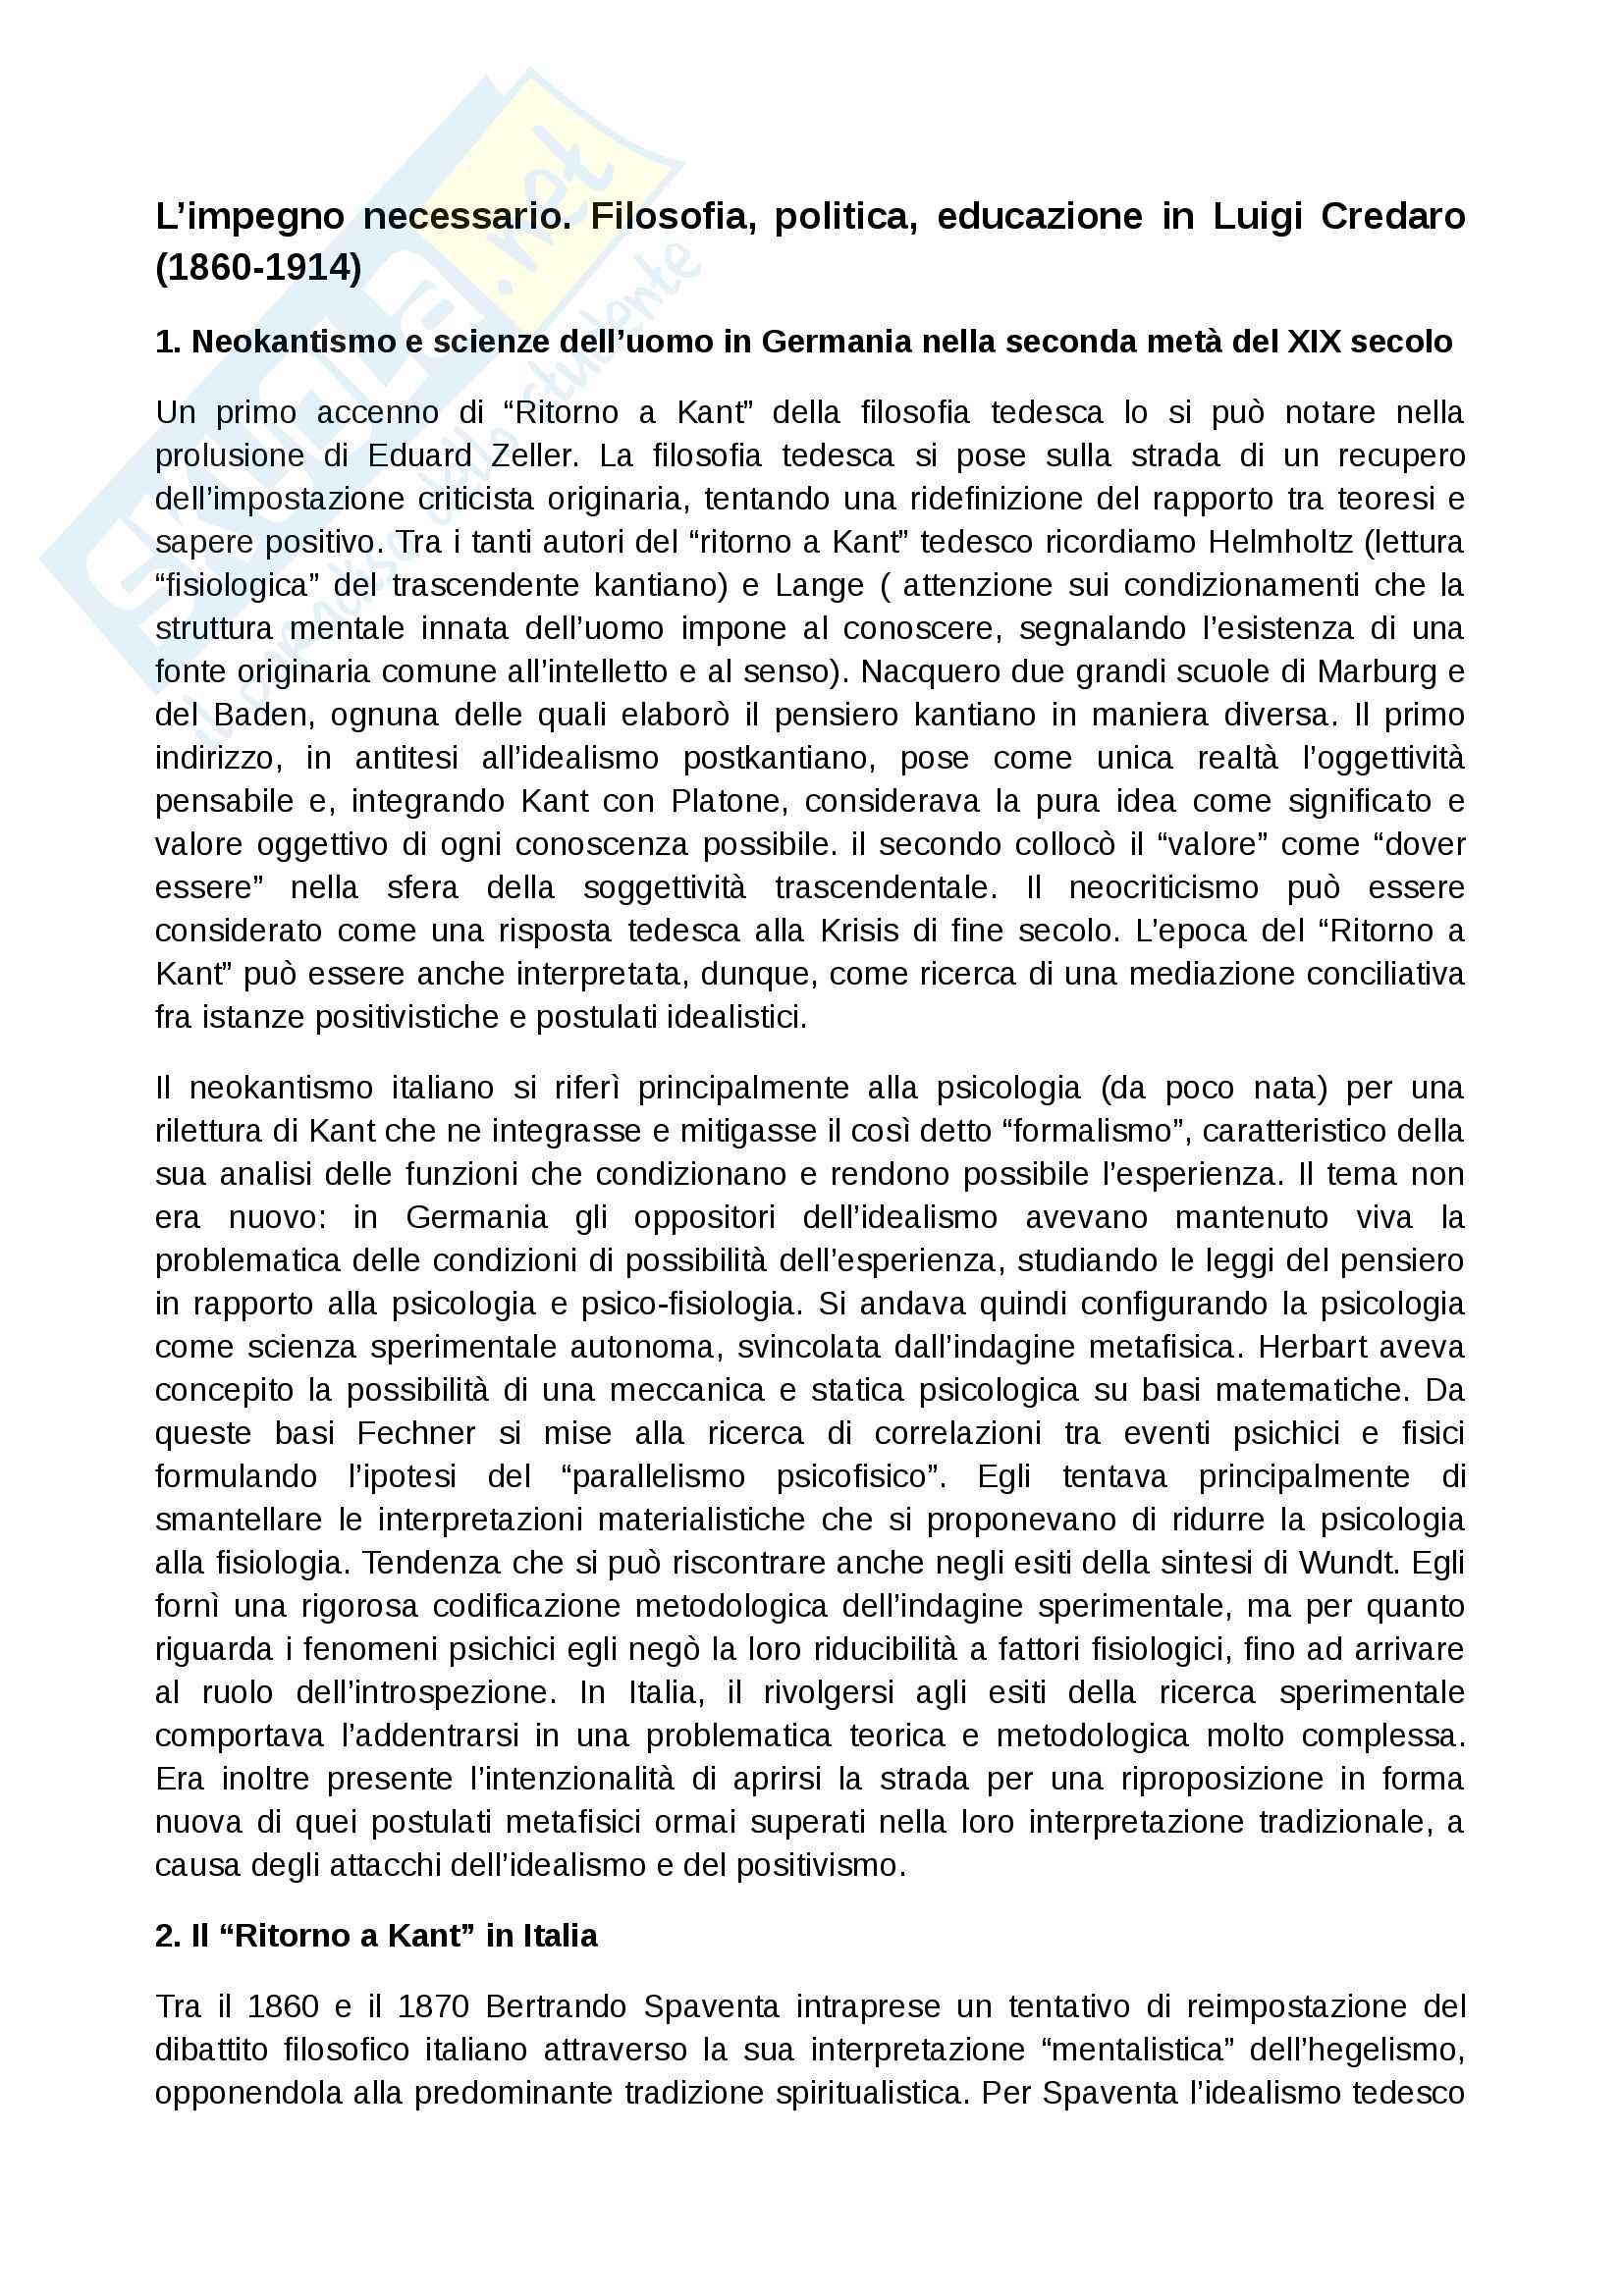 Riassunto esame Pedagogia generale, prof. D'Arcangeli. Libro consigliato L'impegno necessario. Filosofia, politica, educazione in Luigi Credaro, autore M.A. D'Arcangeli